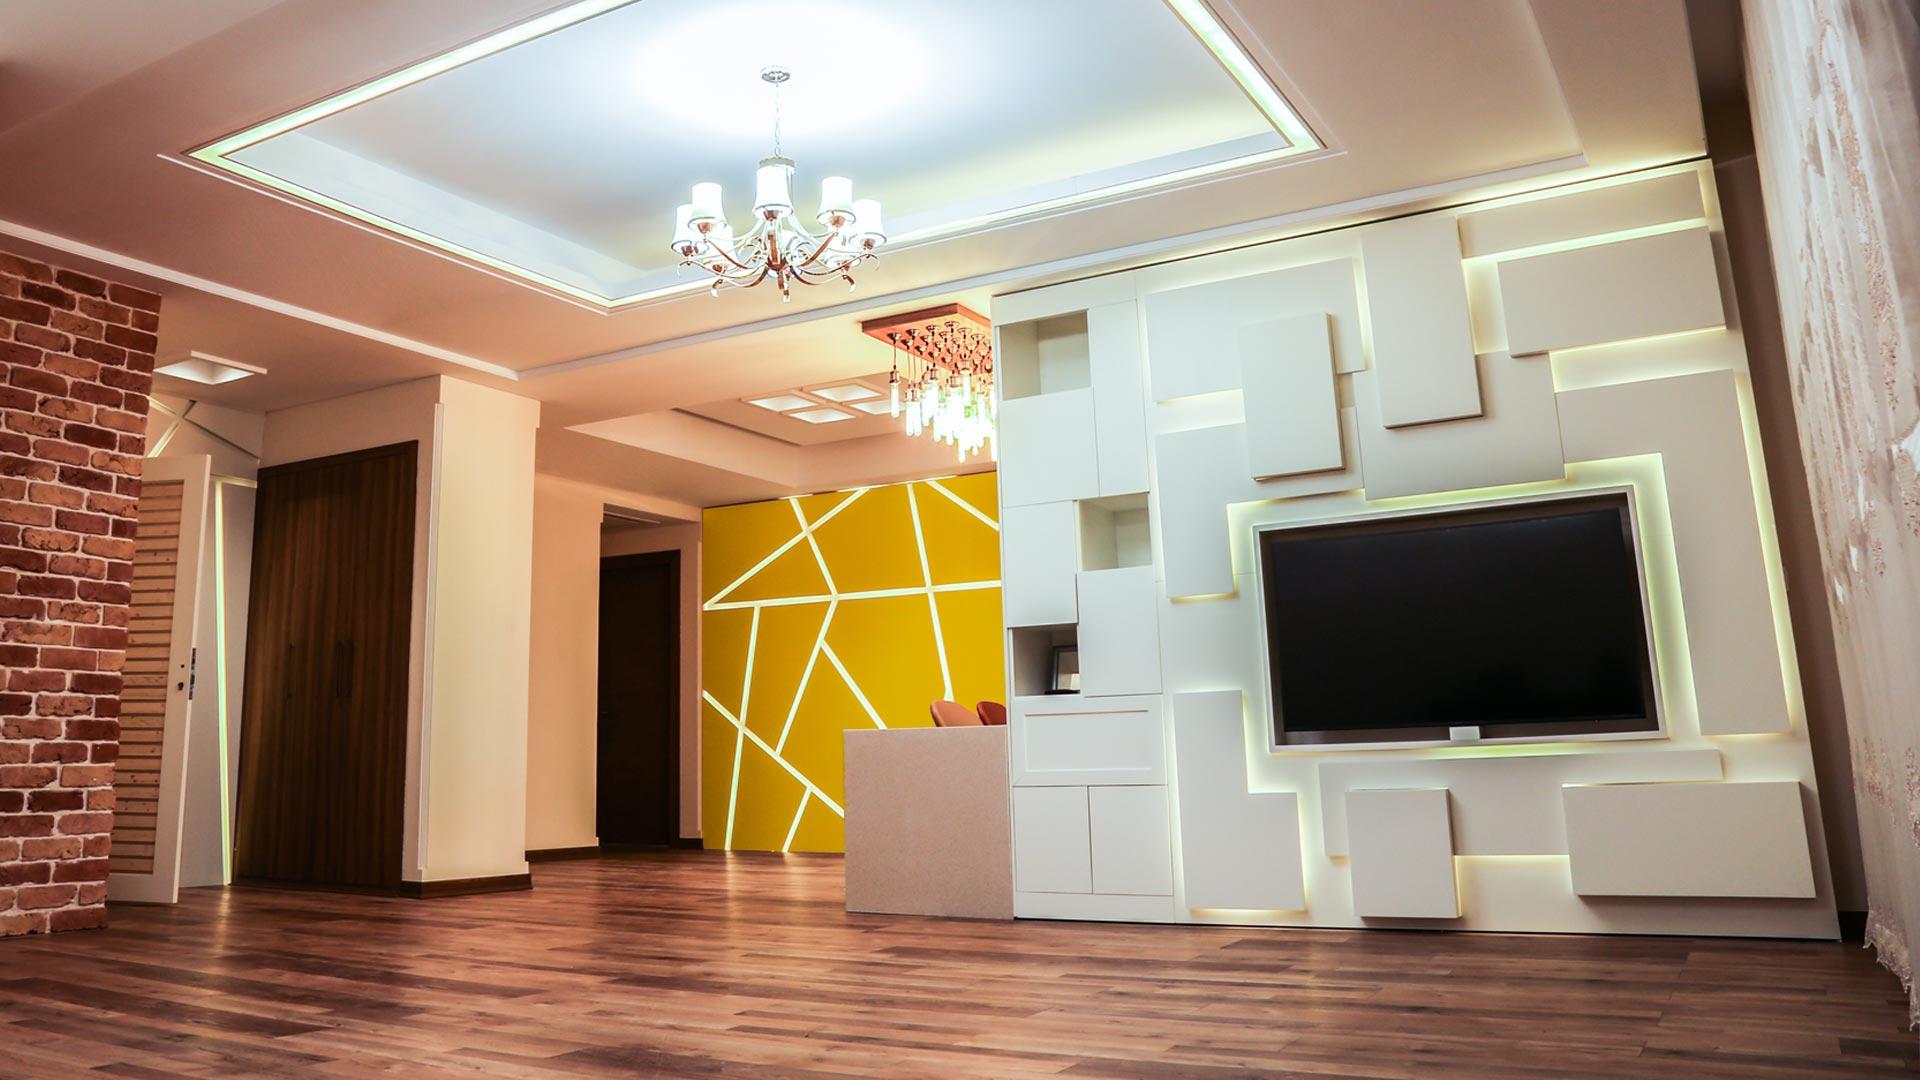 طراحی دکوراسیون منزل - گروه طراحی دکوراسیون داخلی نیکا چوب